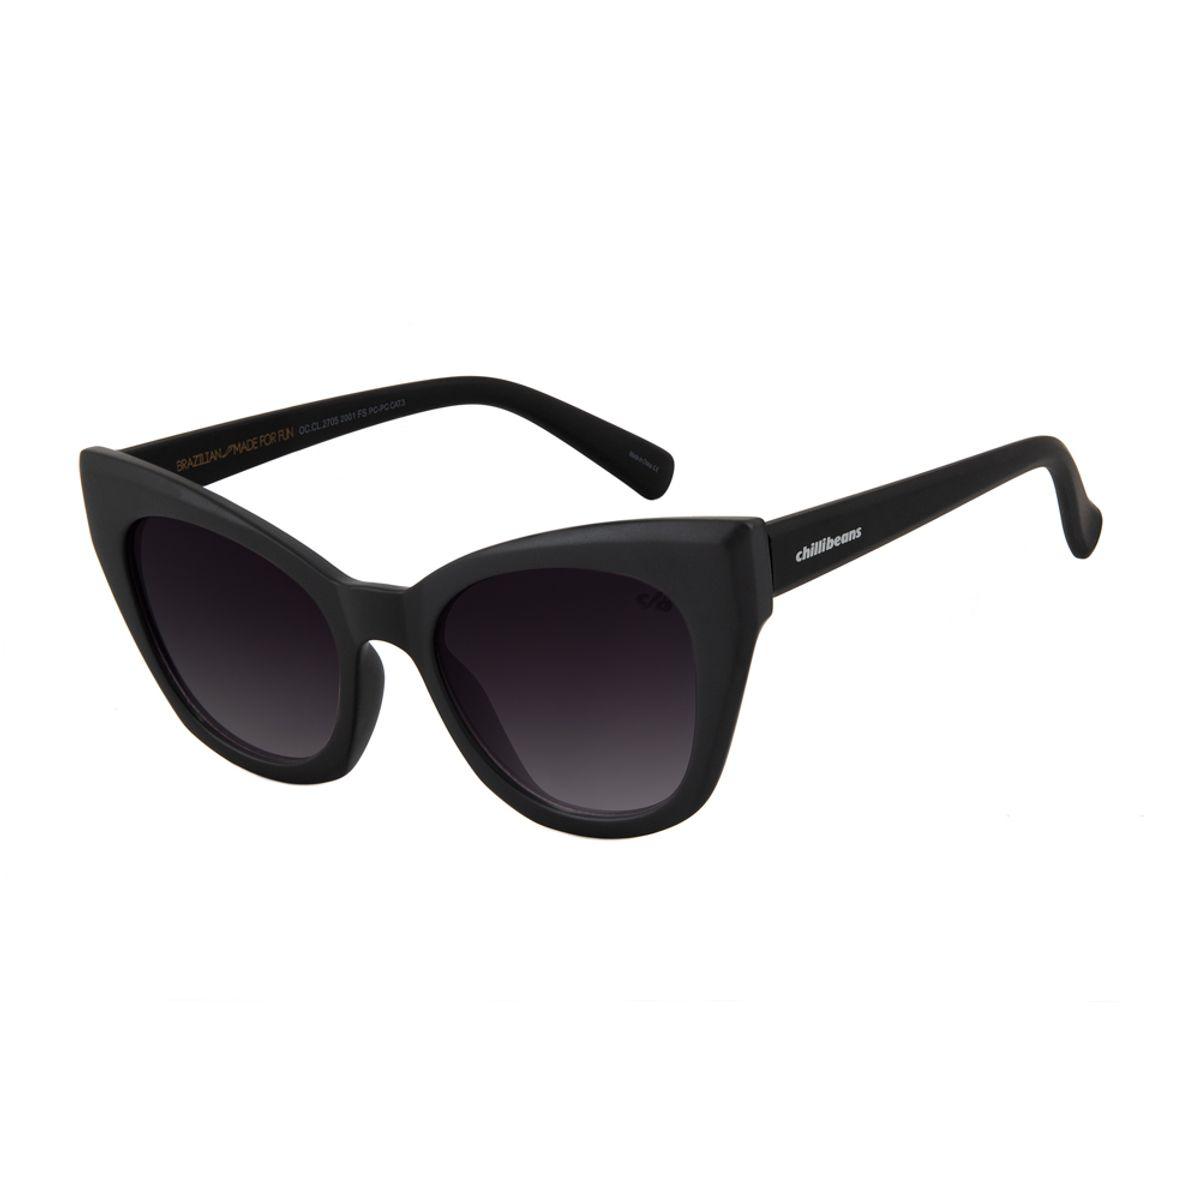 322963d6f Óculos de Sol Chilli Beans Gatinho Lady Like Preto Degradê 2705 ...